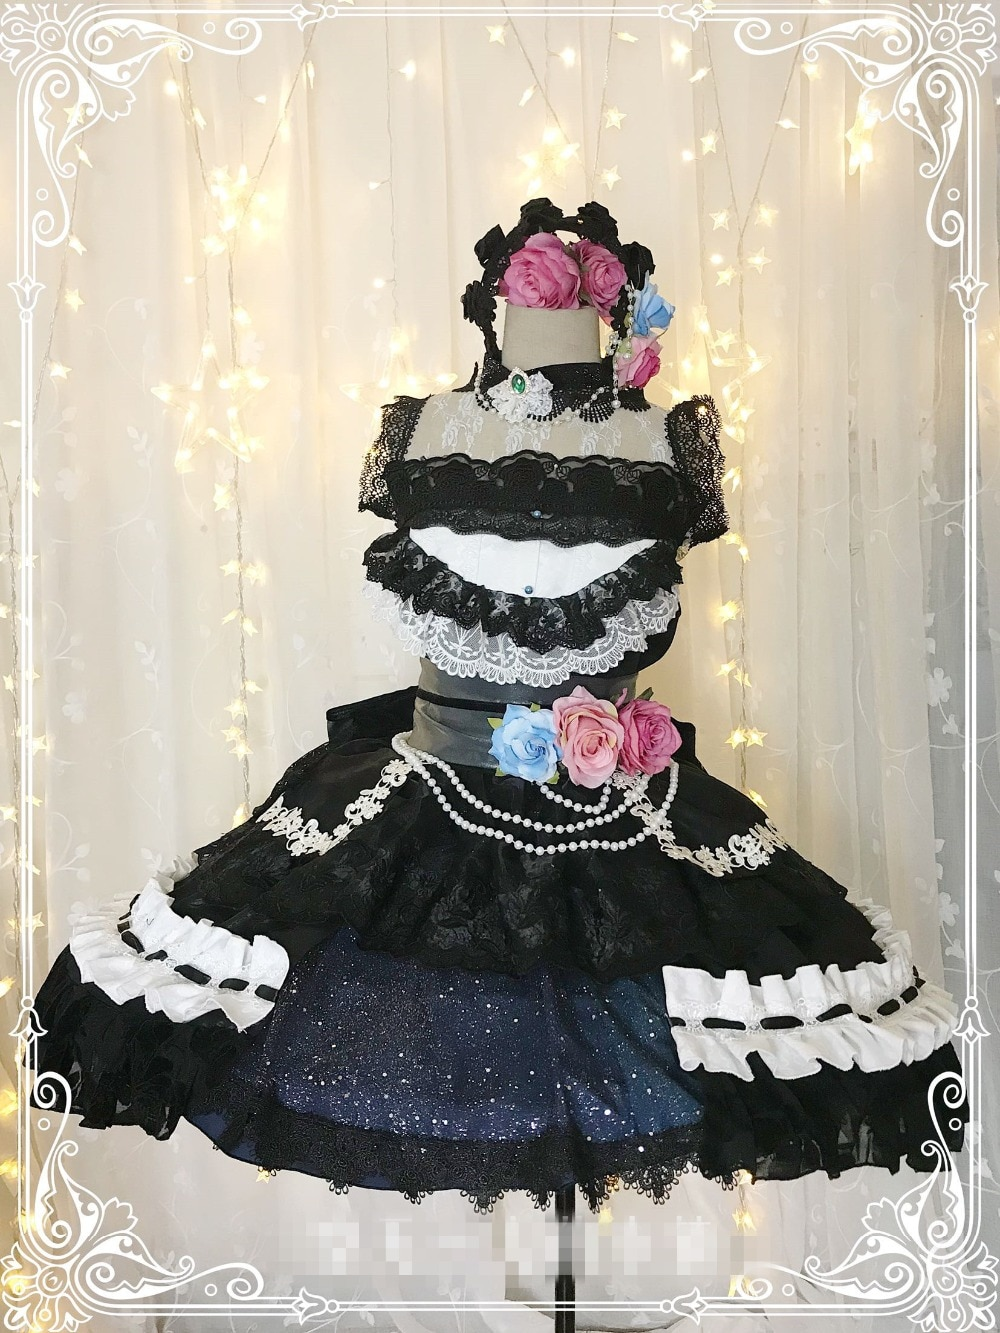 BanG rêve Cosplay robe en dentelle femme halloween belle robe cadeau personnalisé